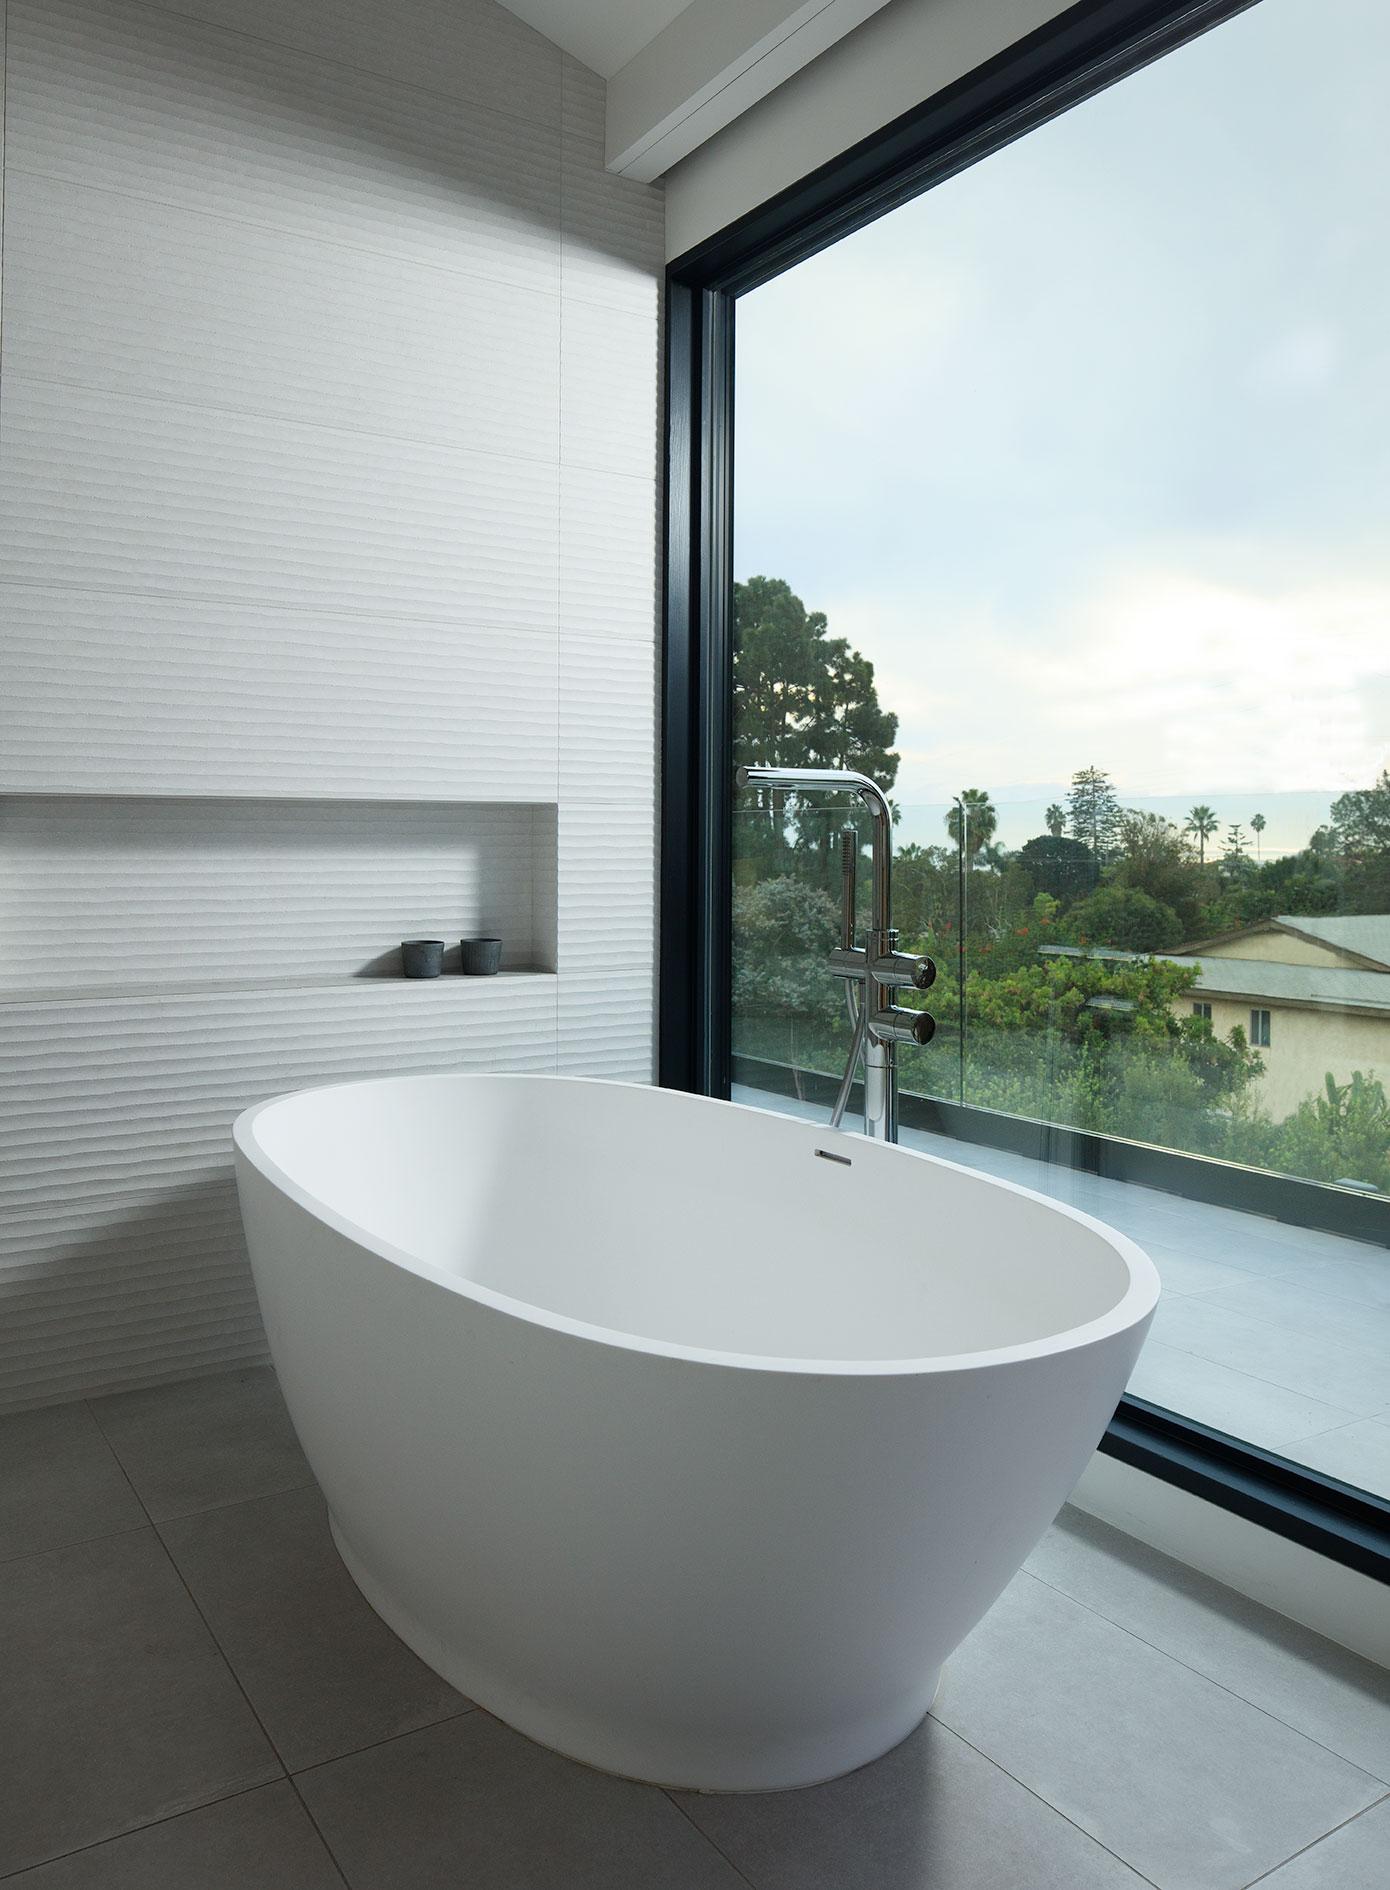 green home design sustainable LEED bathroom bathtub soaking tub